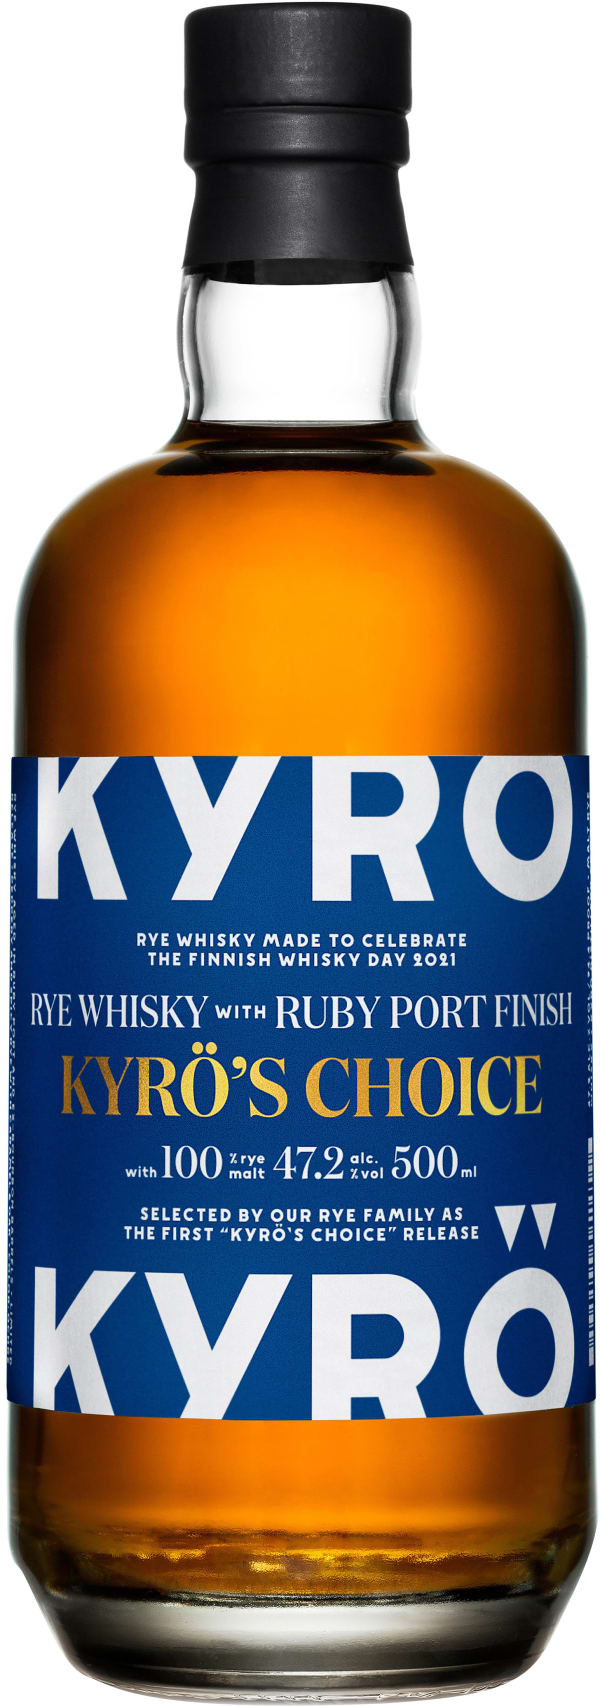 Kyrö's Choice: Rye Whisky with Ruby Port Finish